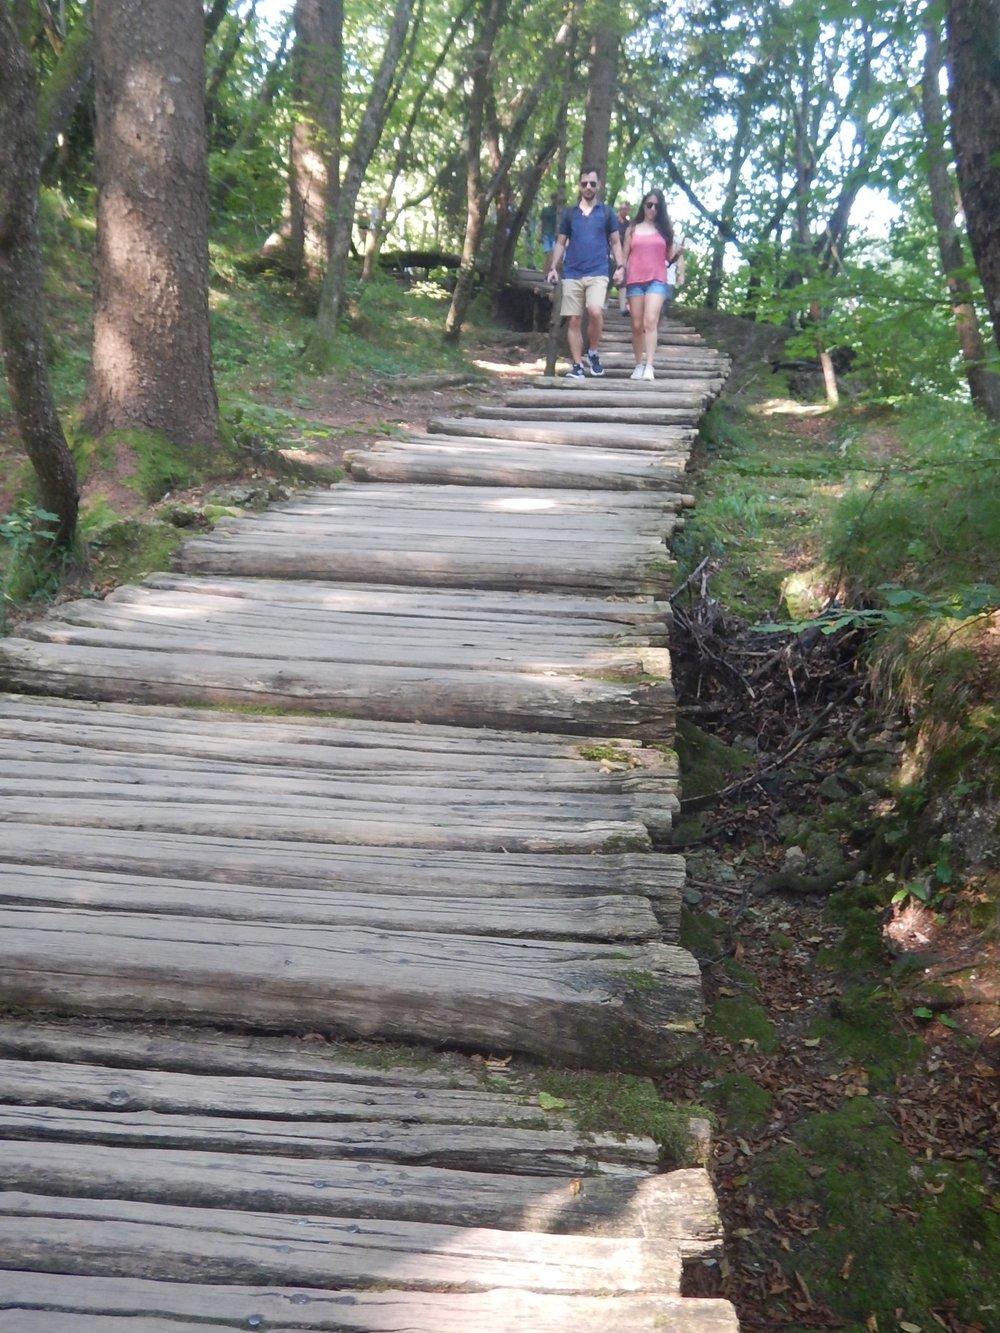 more steps on the boardwalk